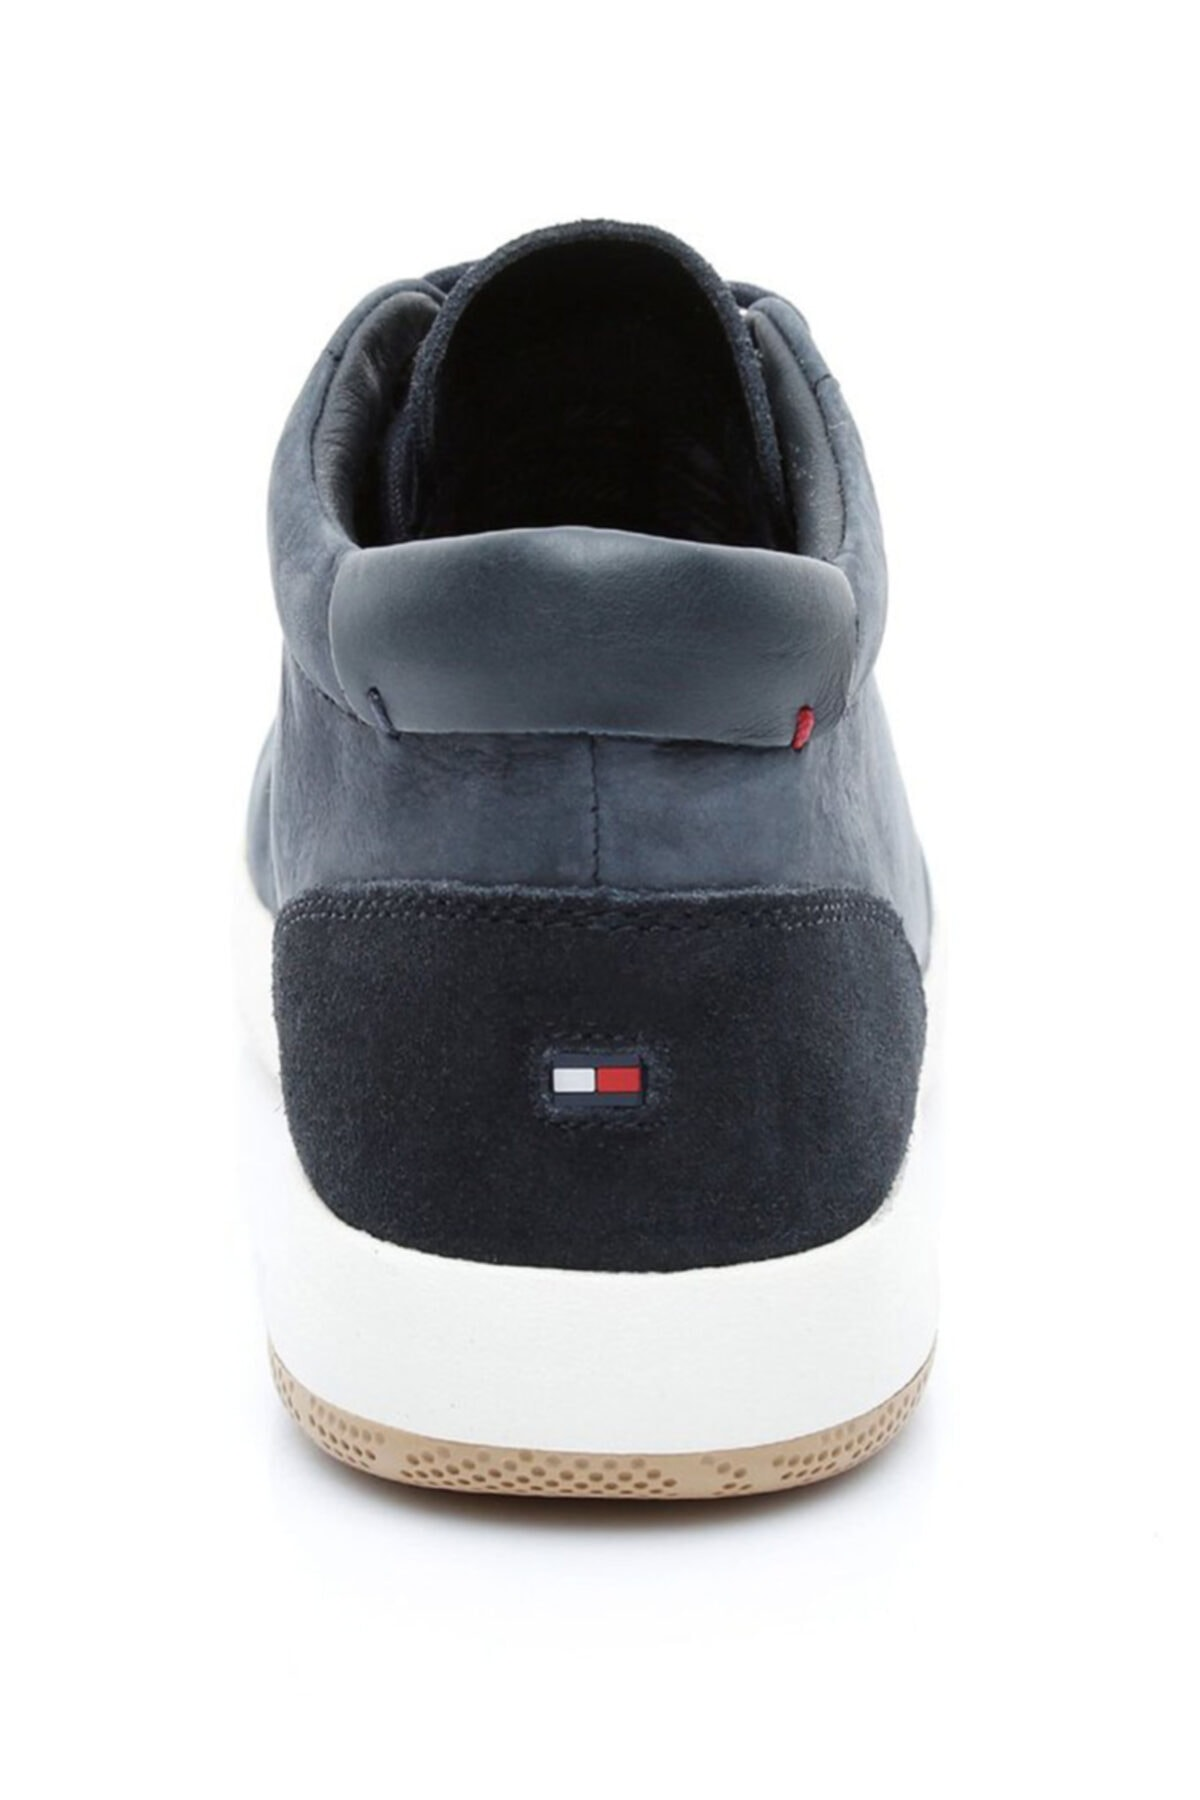 Tommy Hilfiger Erkek Ayakkabı Fm0fm01716 U004397 2